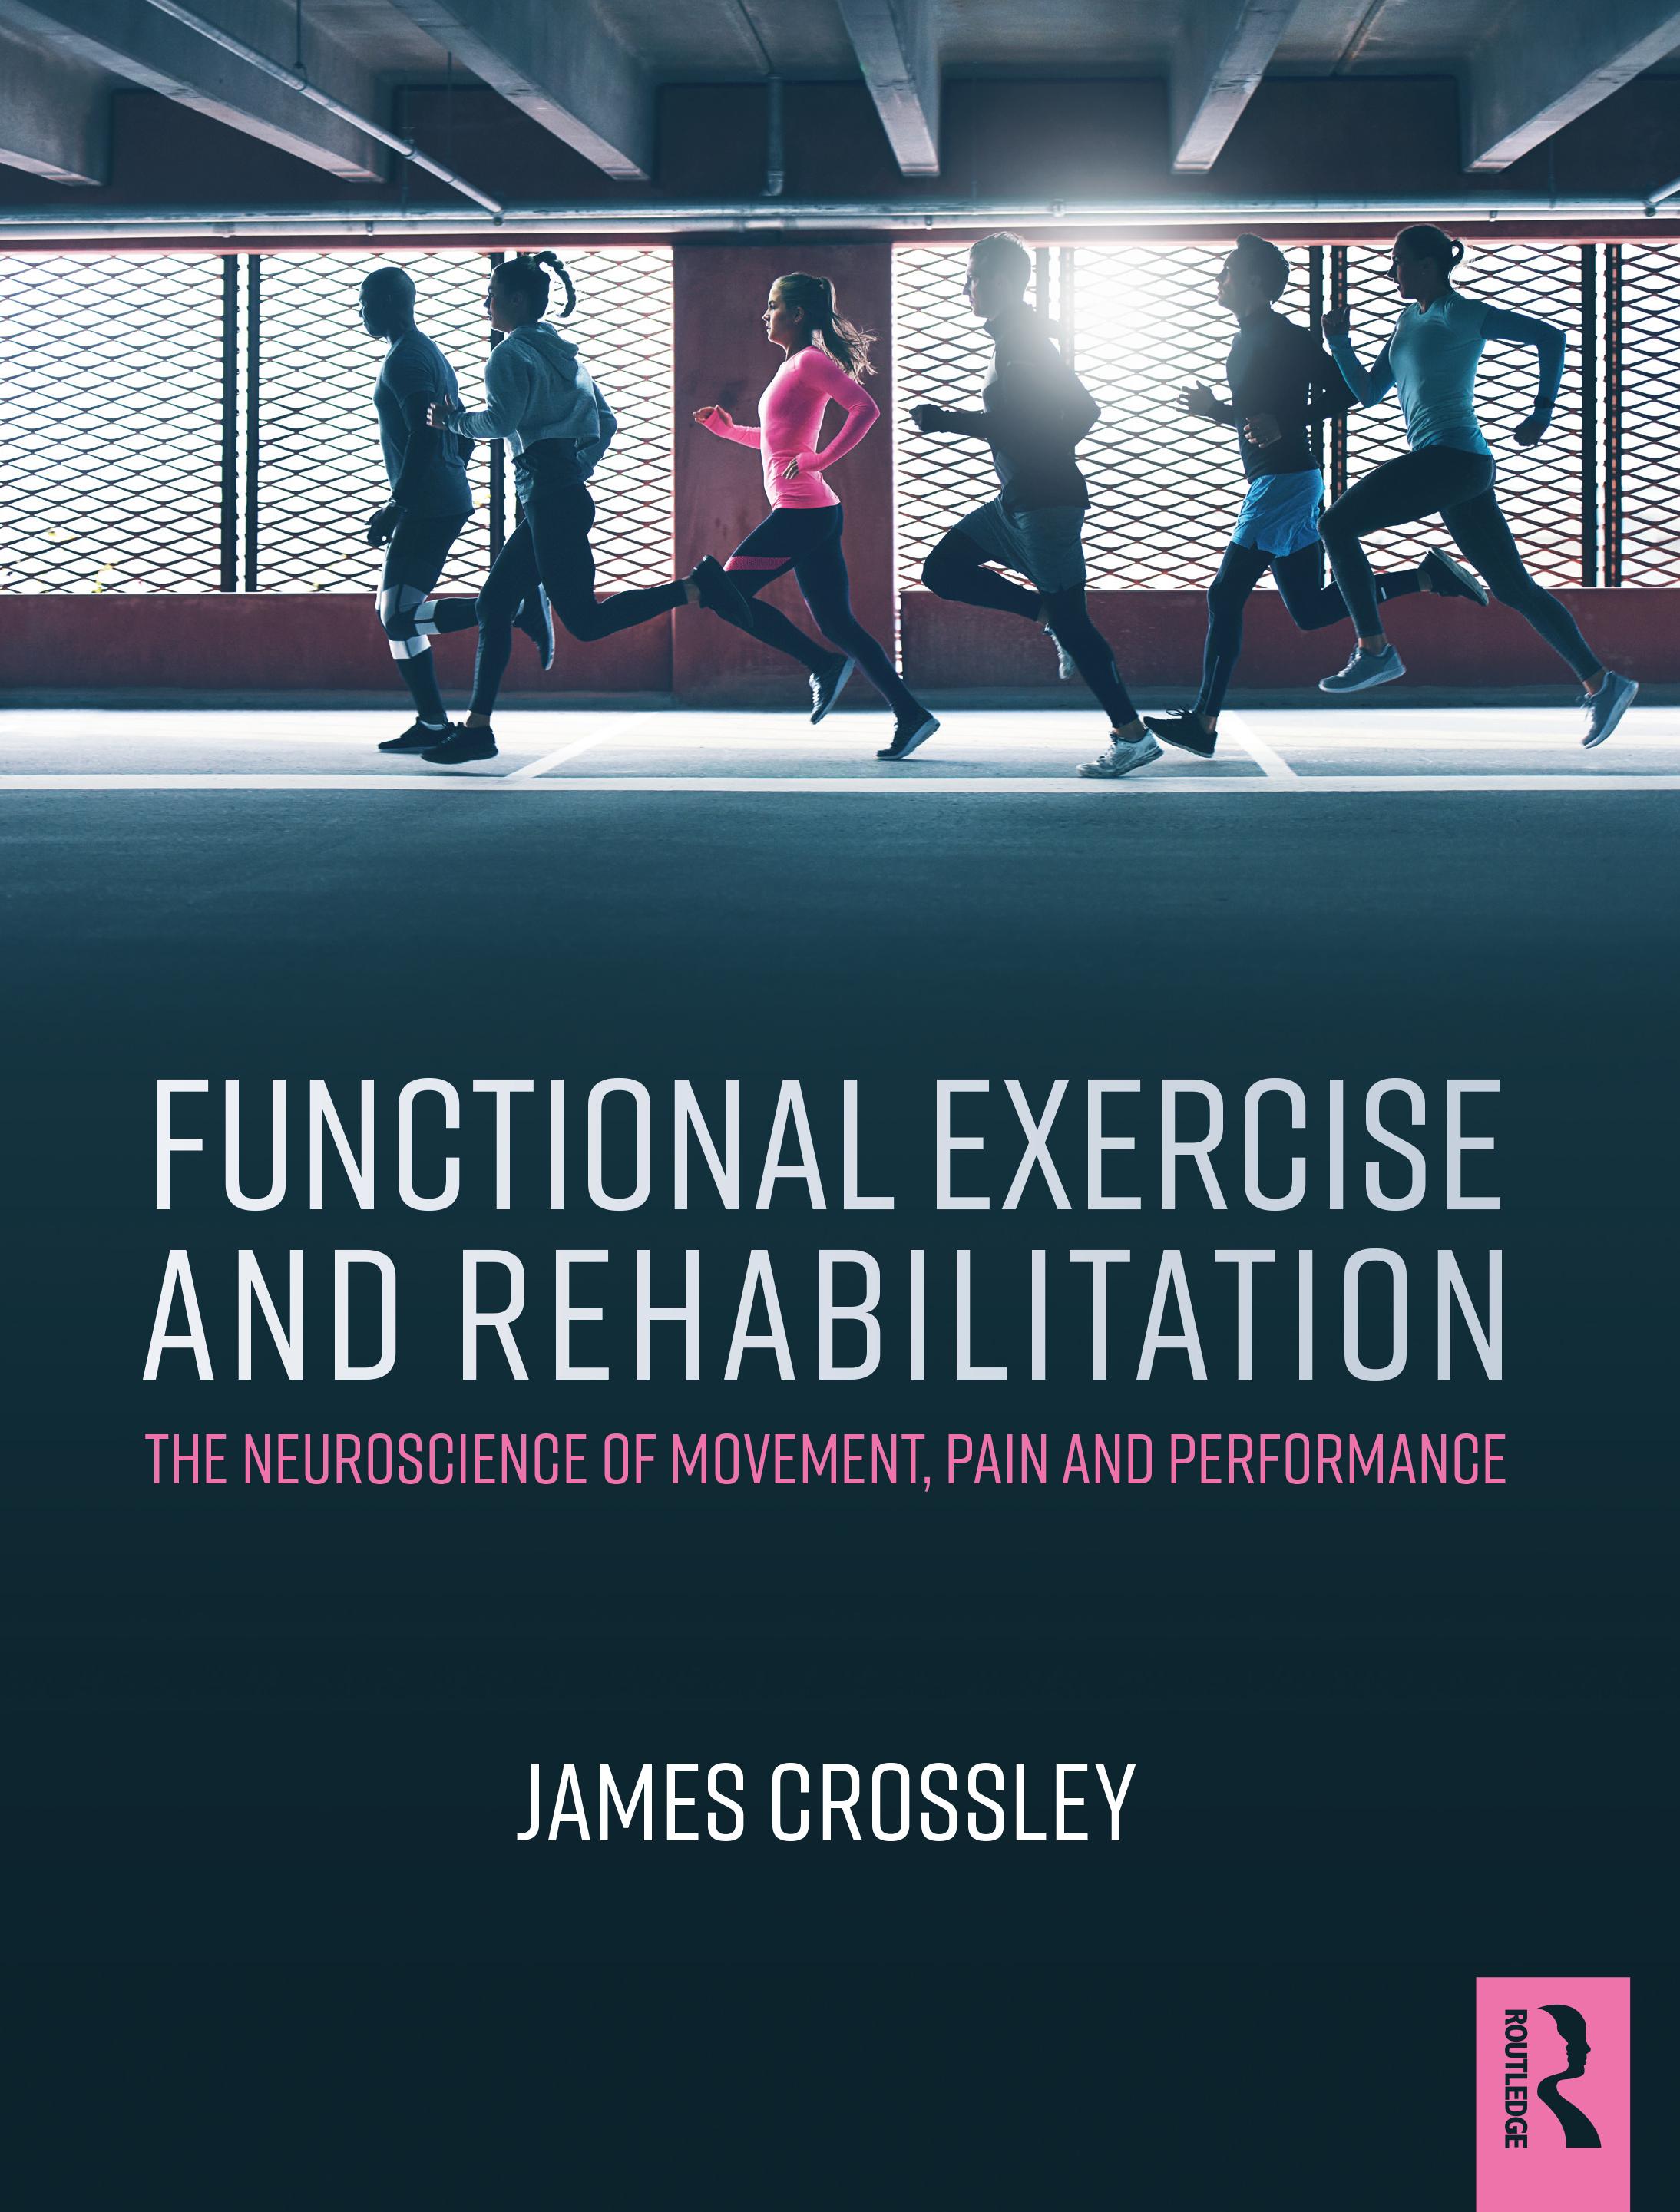 Functional Exercise and Rehabilitation